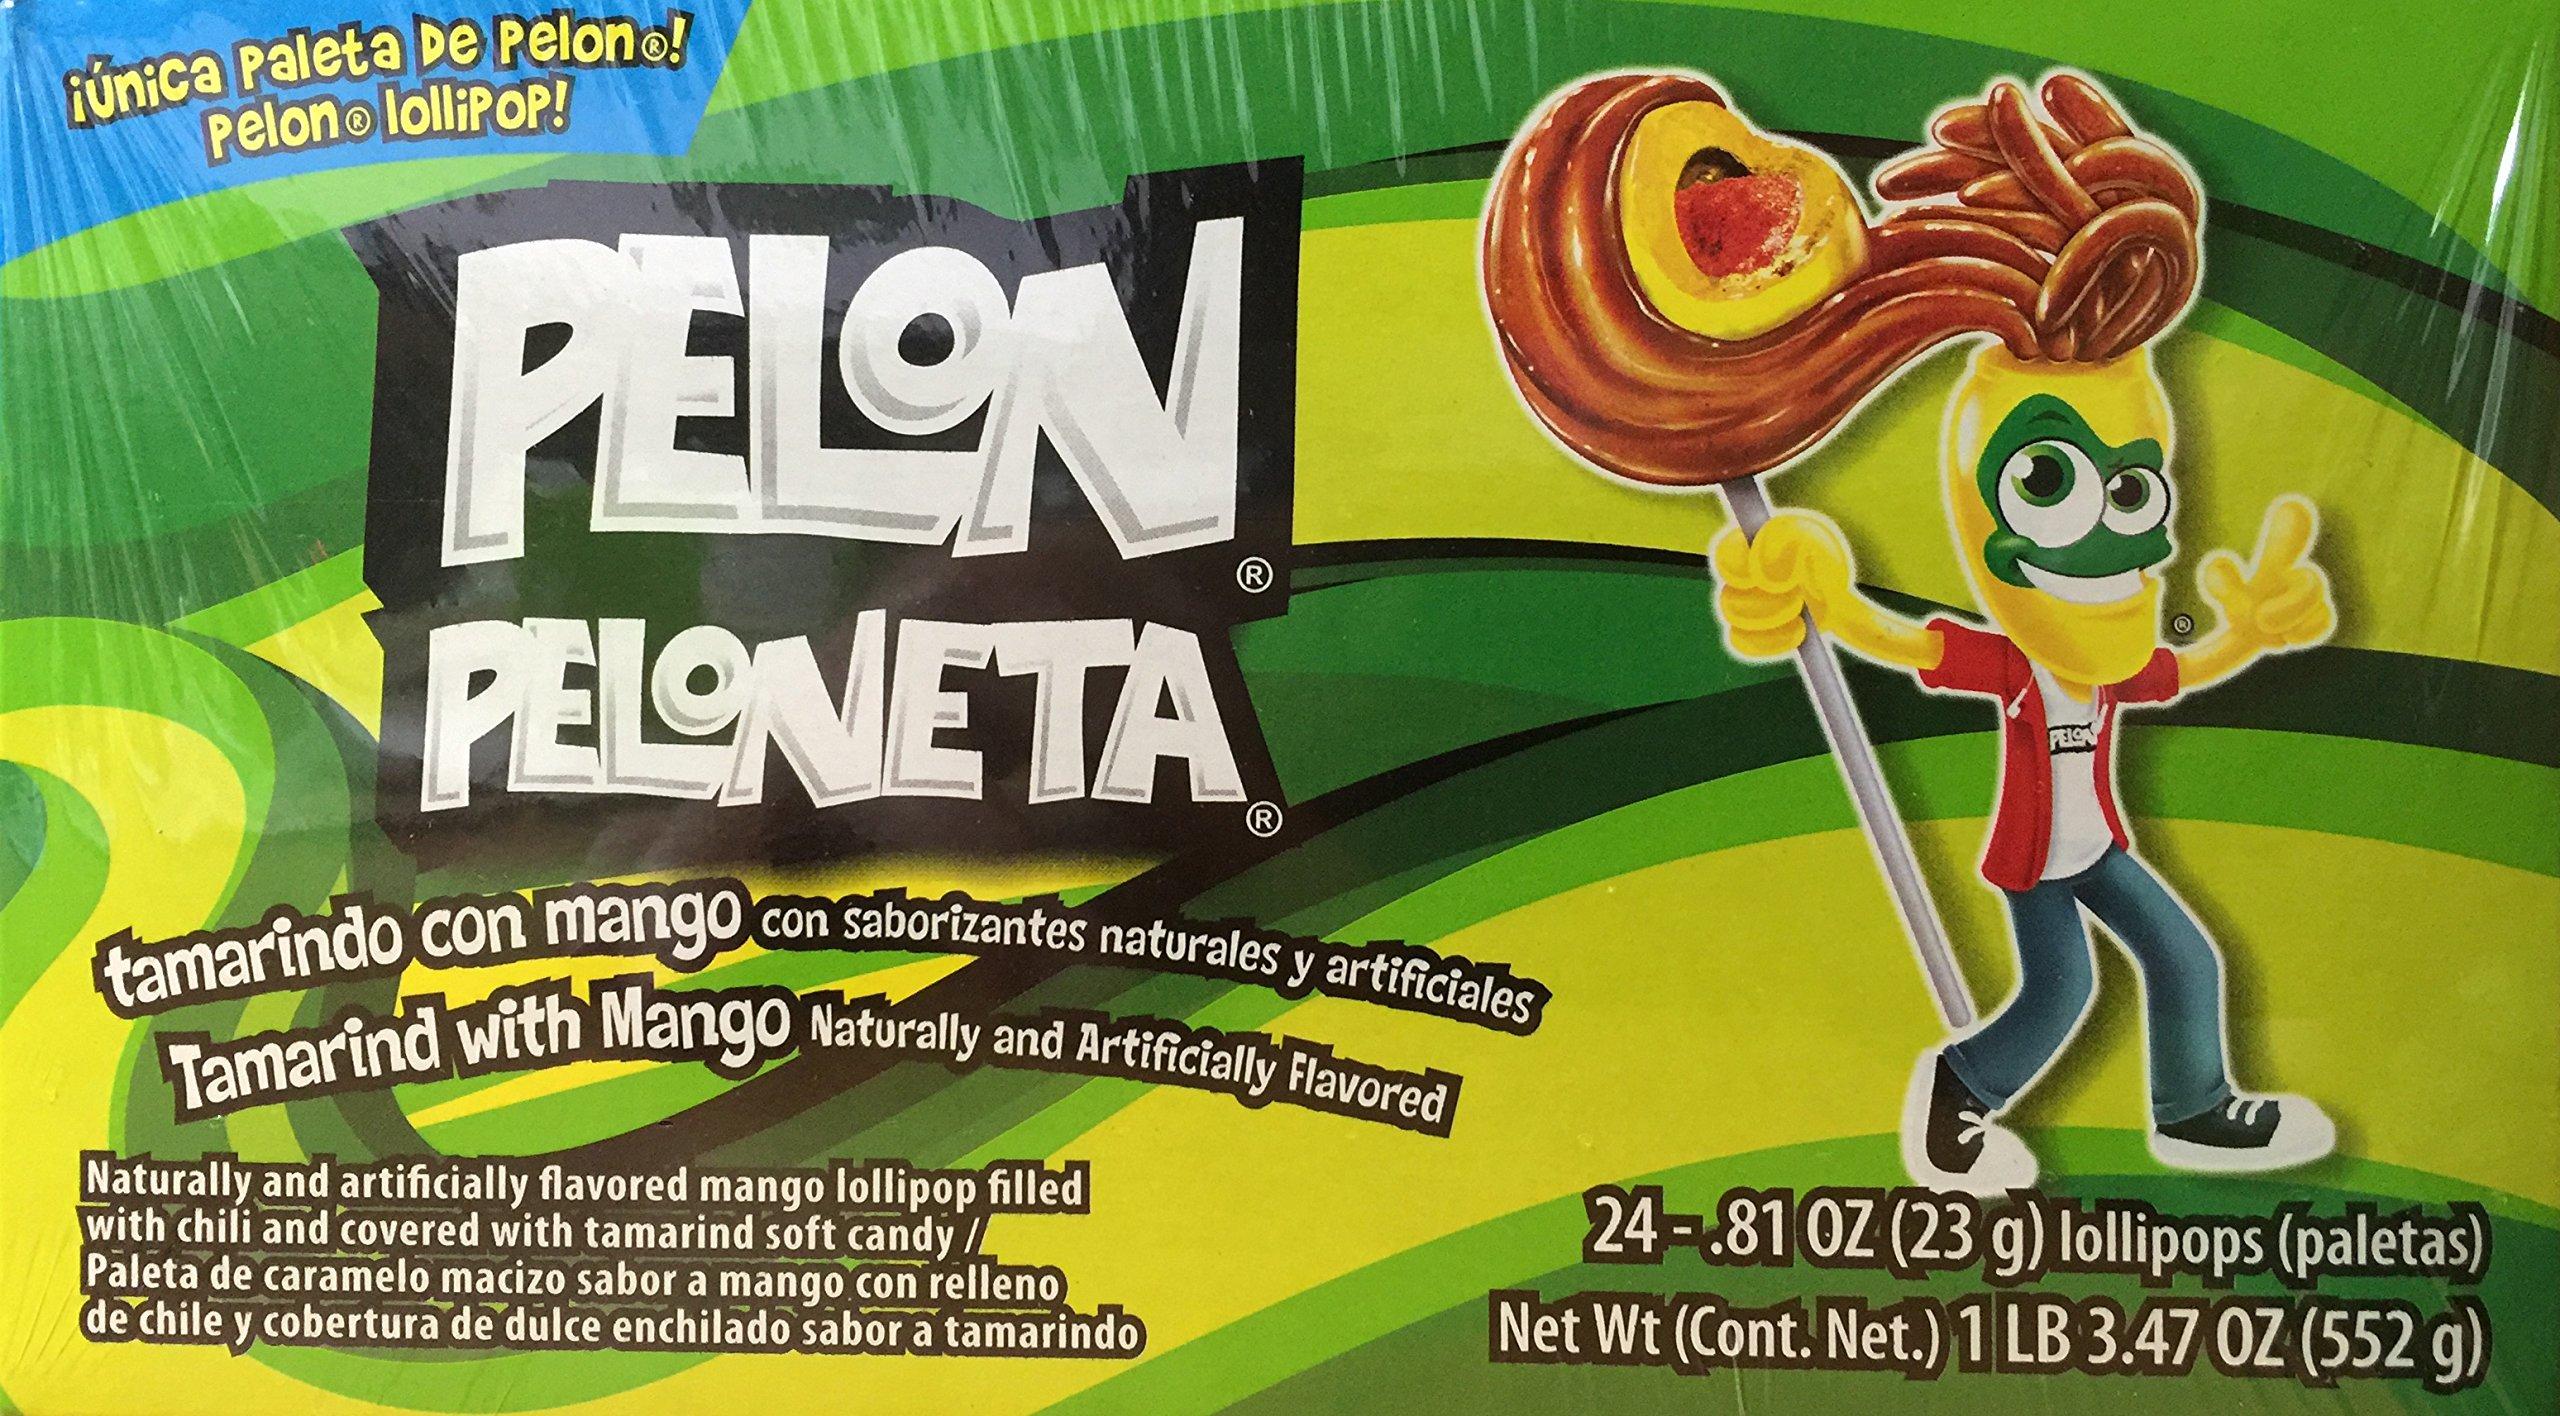 Pelon Peloneta Tamarind with Mango Lollipop, 24 Count